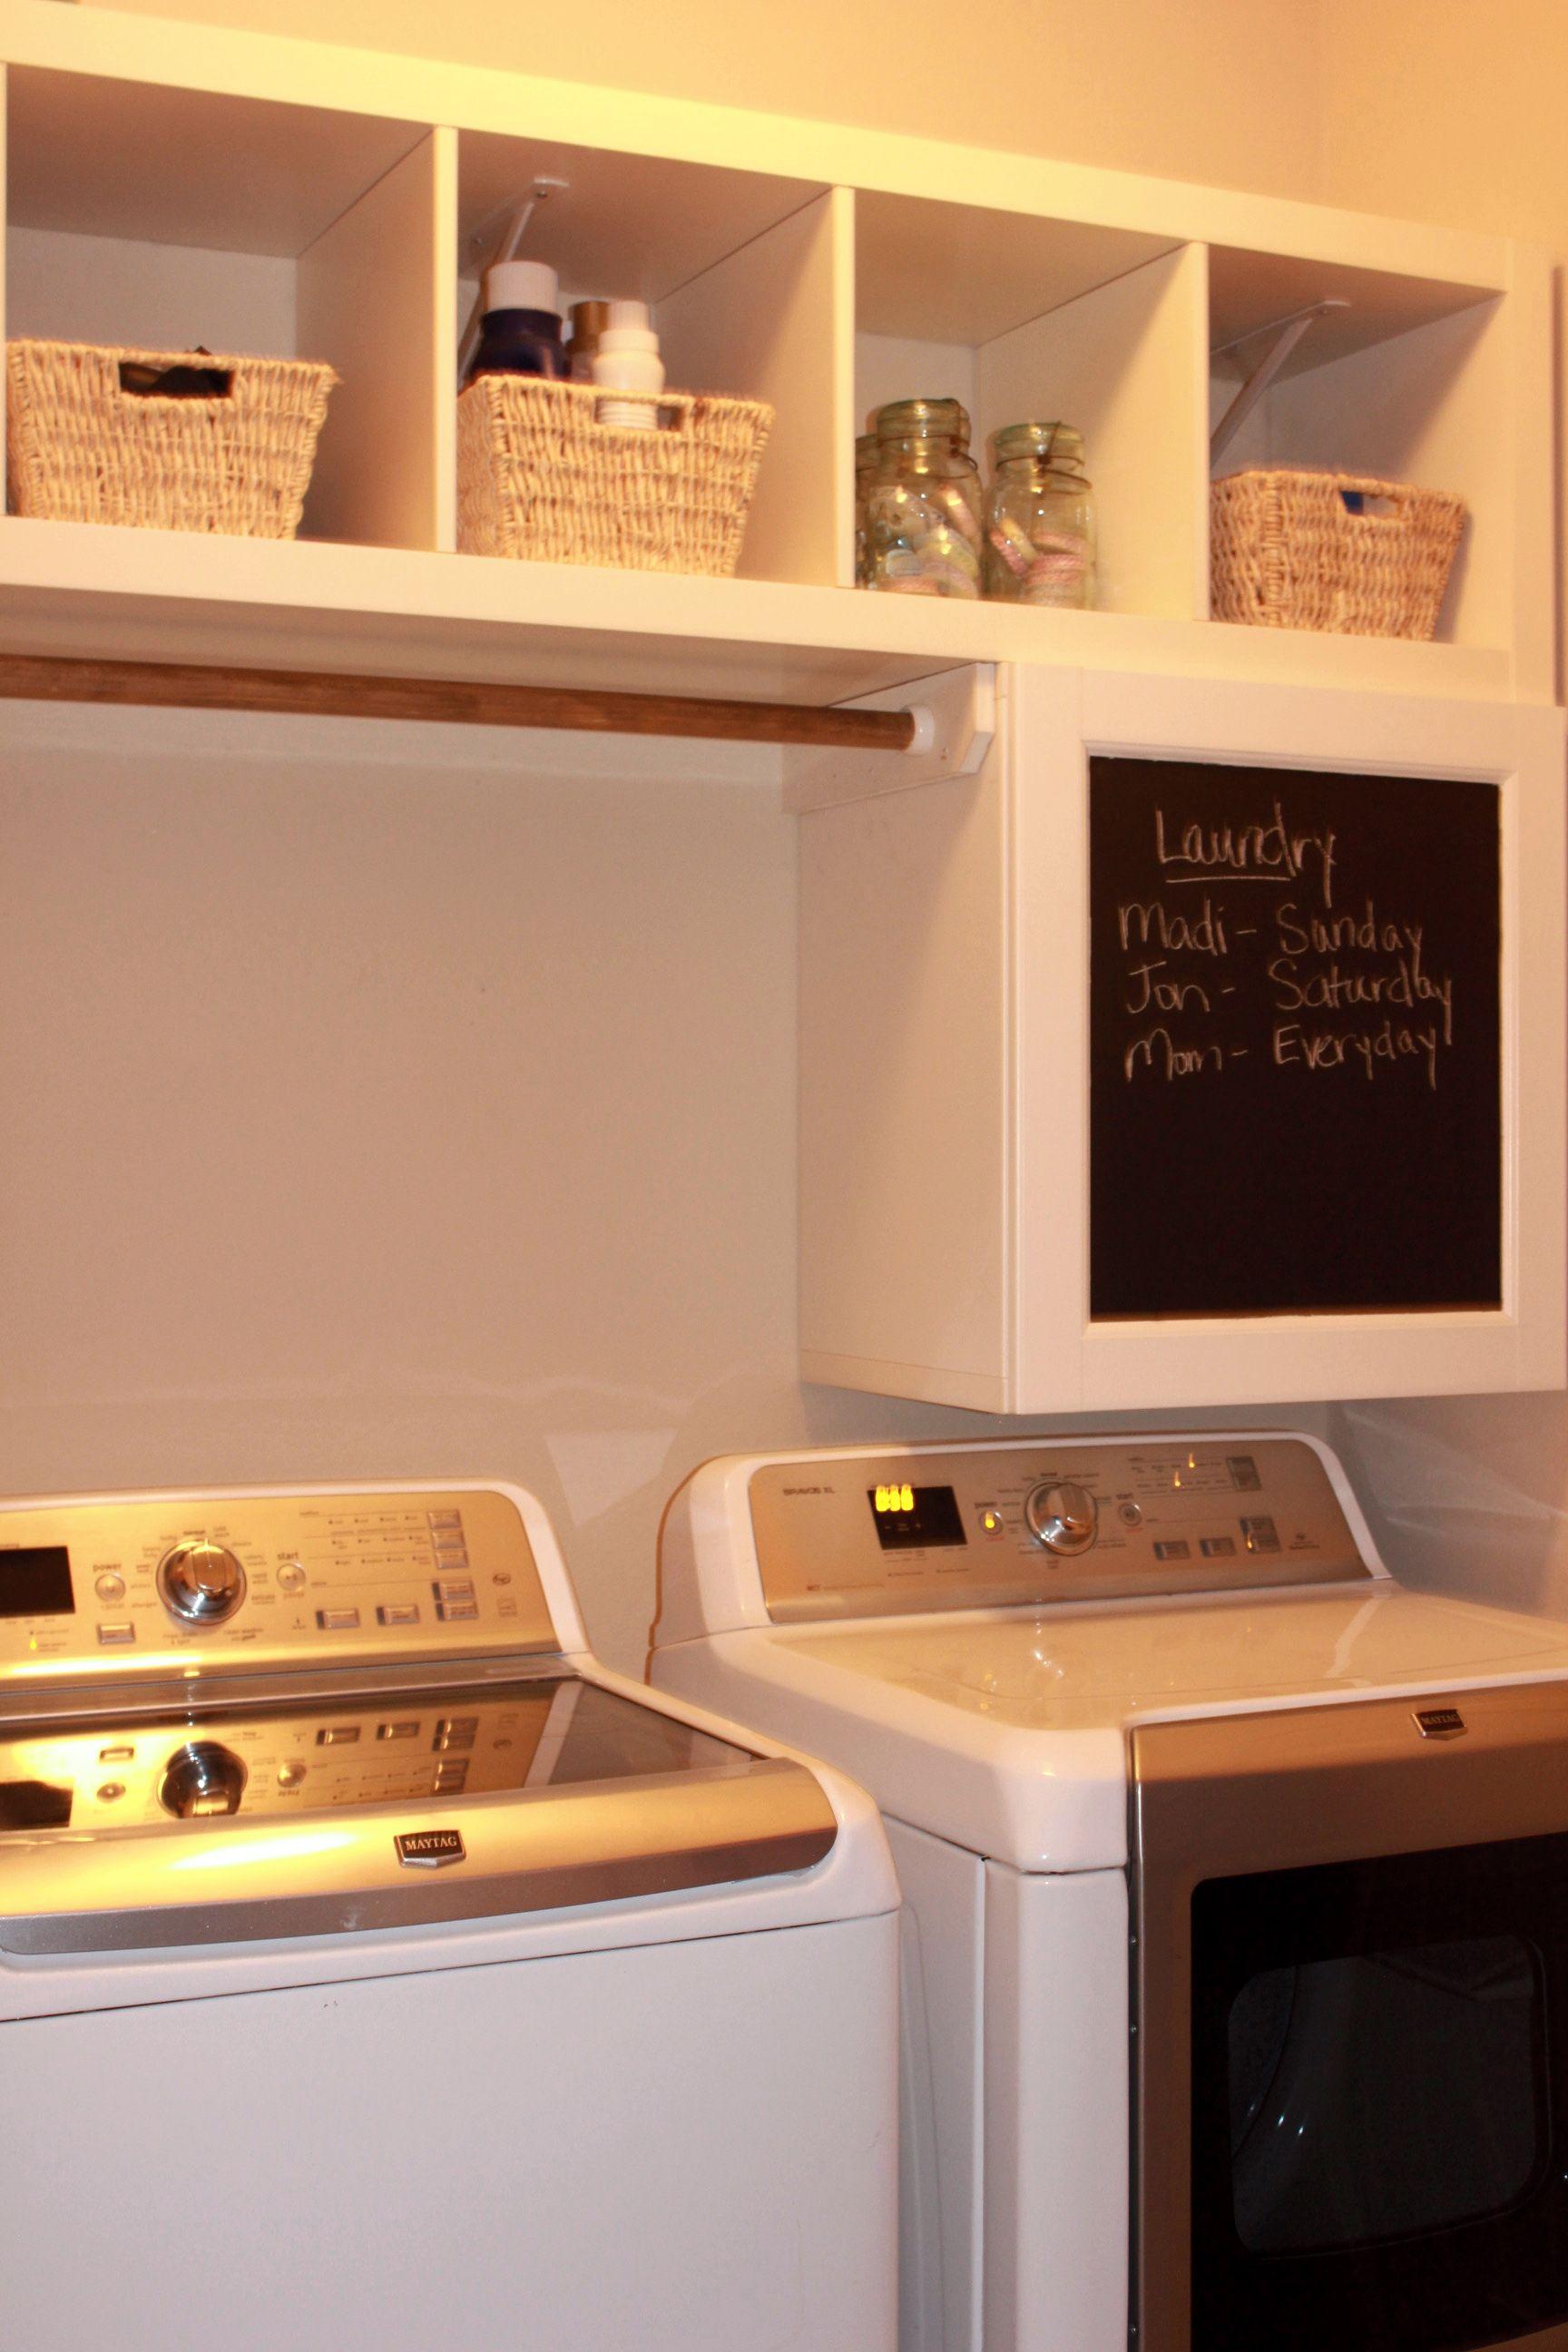 Wfmw Mini Laundry Room Makeover Maytagmom Tips Ikea Hack Home Wiring Cabinet Wearethatfamilycom